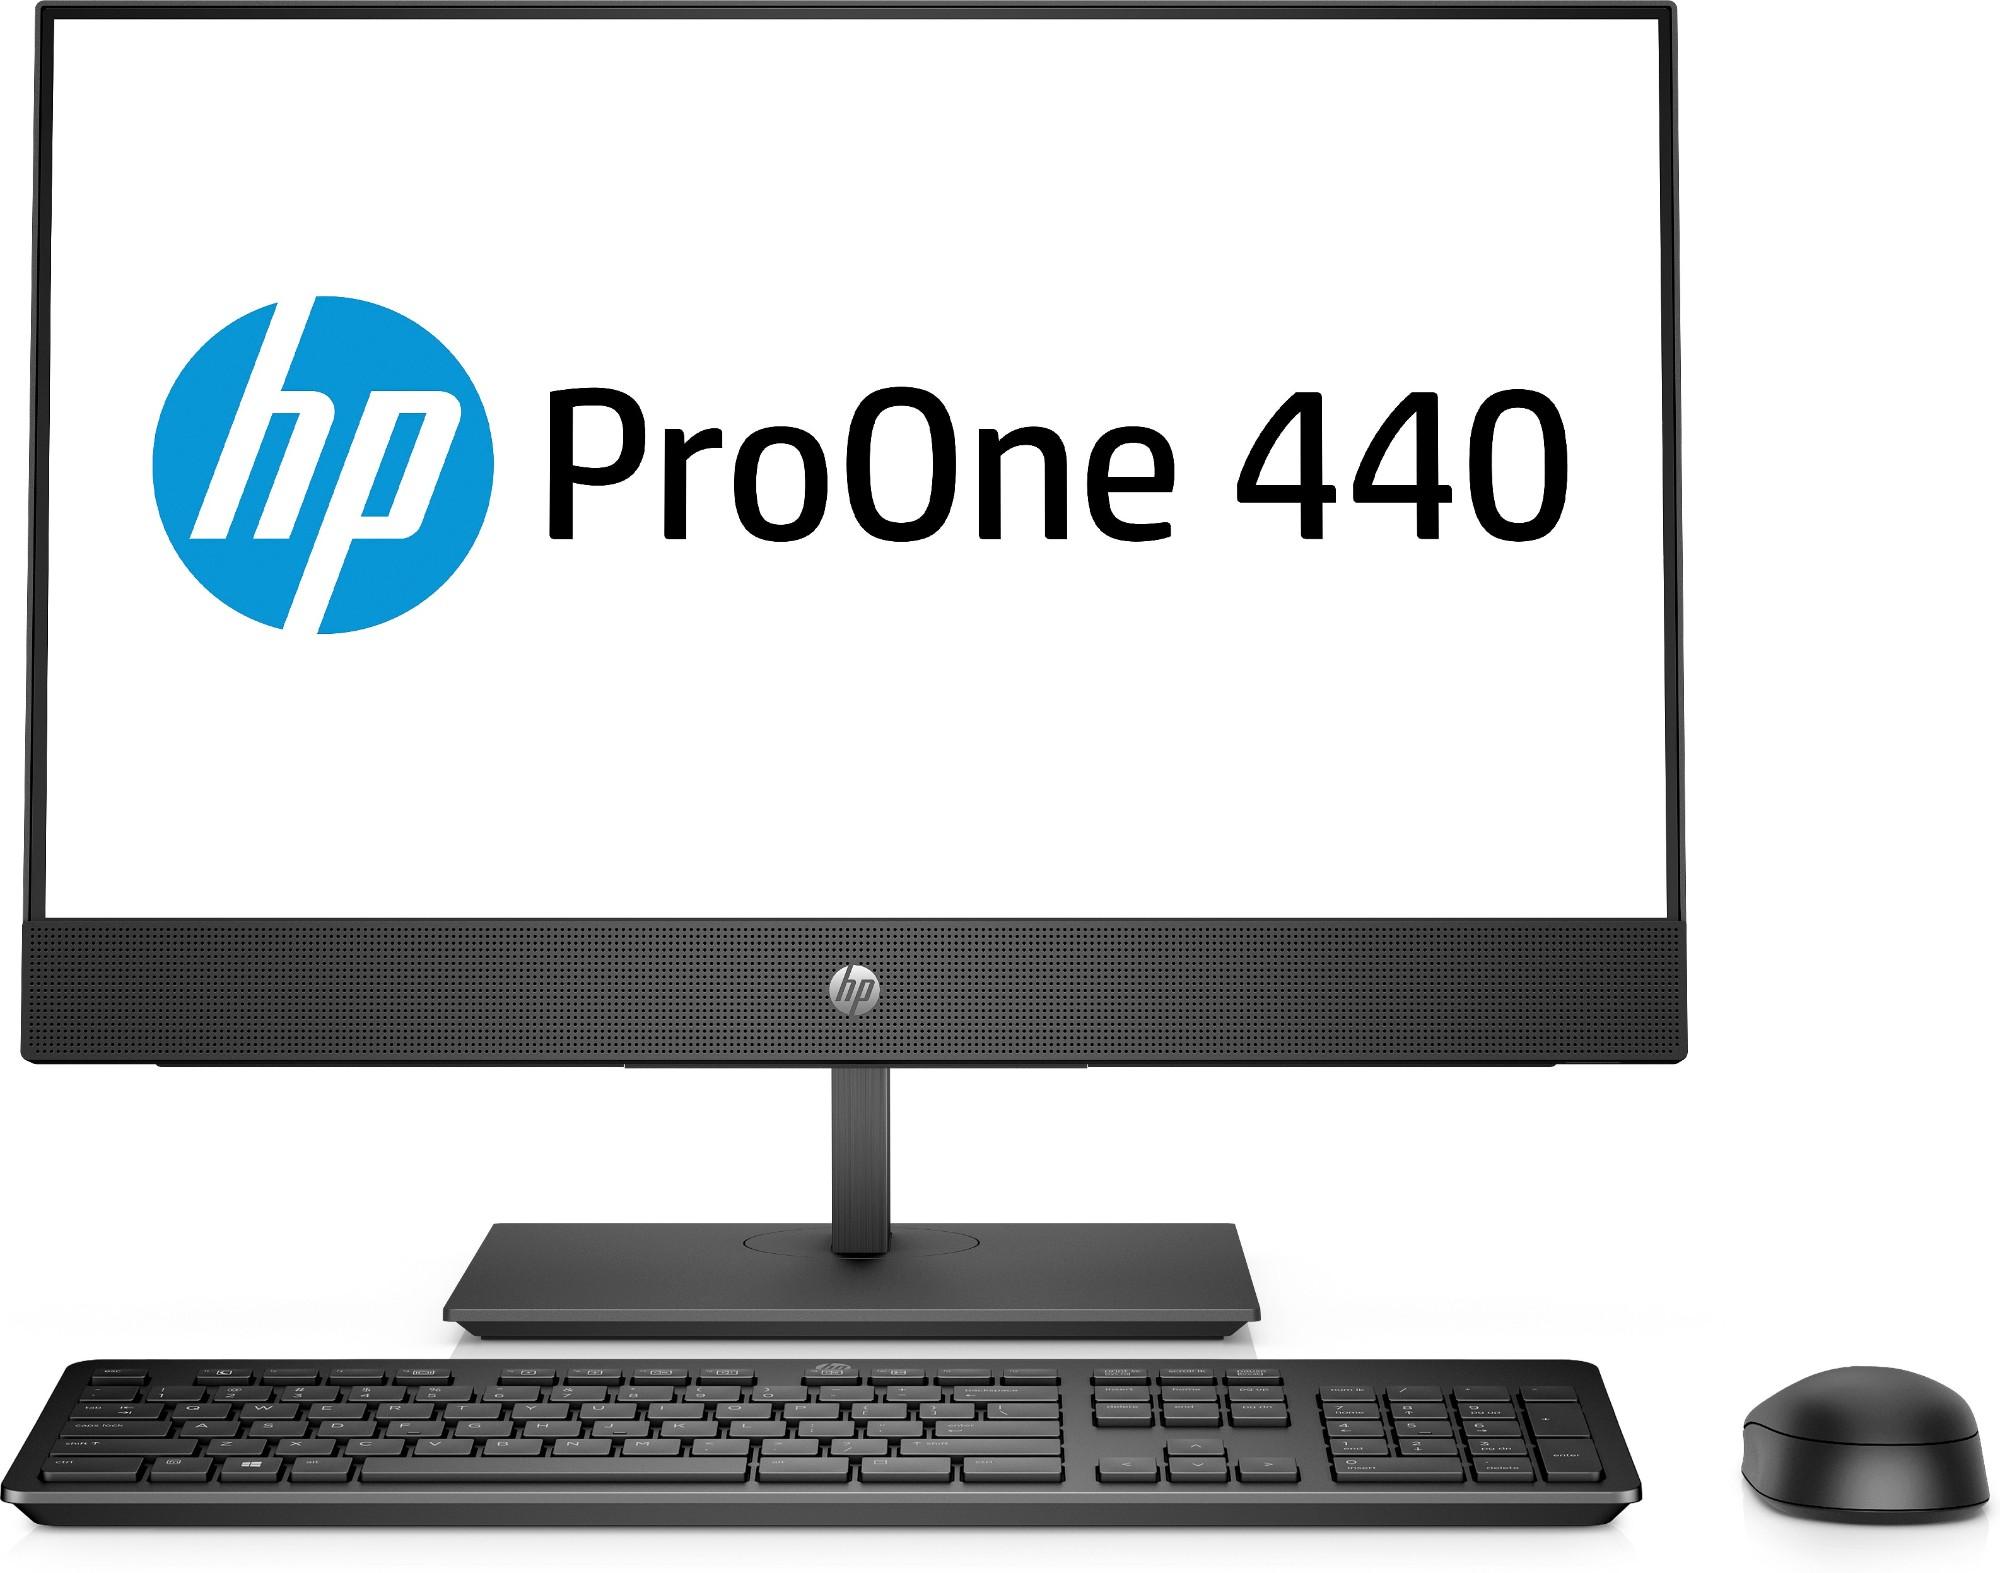 "HP ProOne 440 G4 60.5 cm (23.8"") 1920 x 1080 pixels 2.1 GHz 8th gen Intel® Core™ i5 i5-8500T Black All-in-One PC"